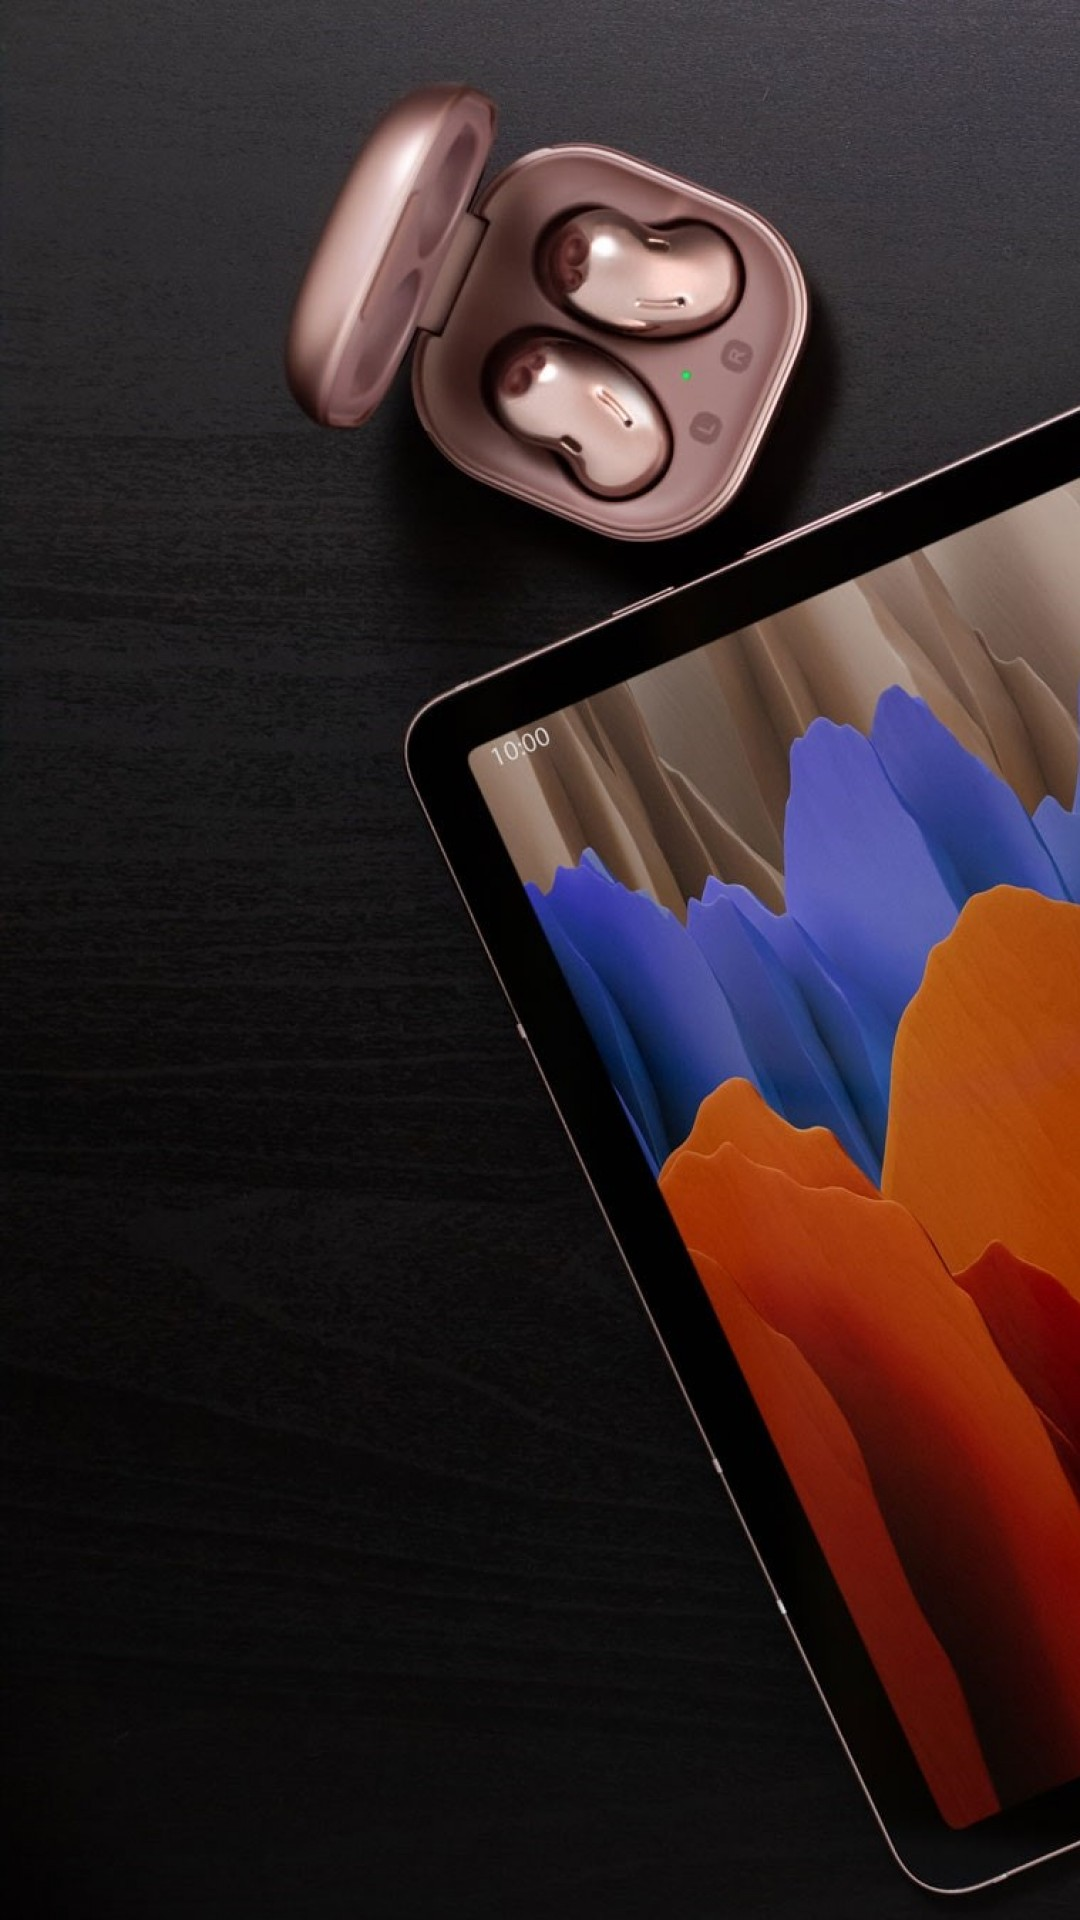 Wallpaper Samsung Galaxy Tab S7 Samsung Galaxy Buds Live Unpacked 2020 Samsungevent Hi Tech 22770